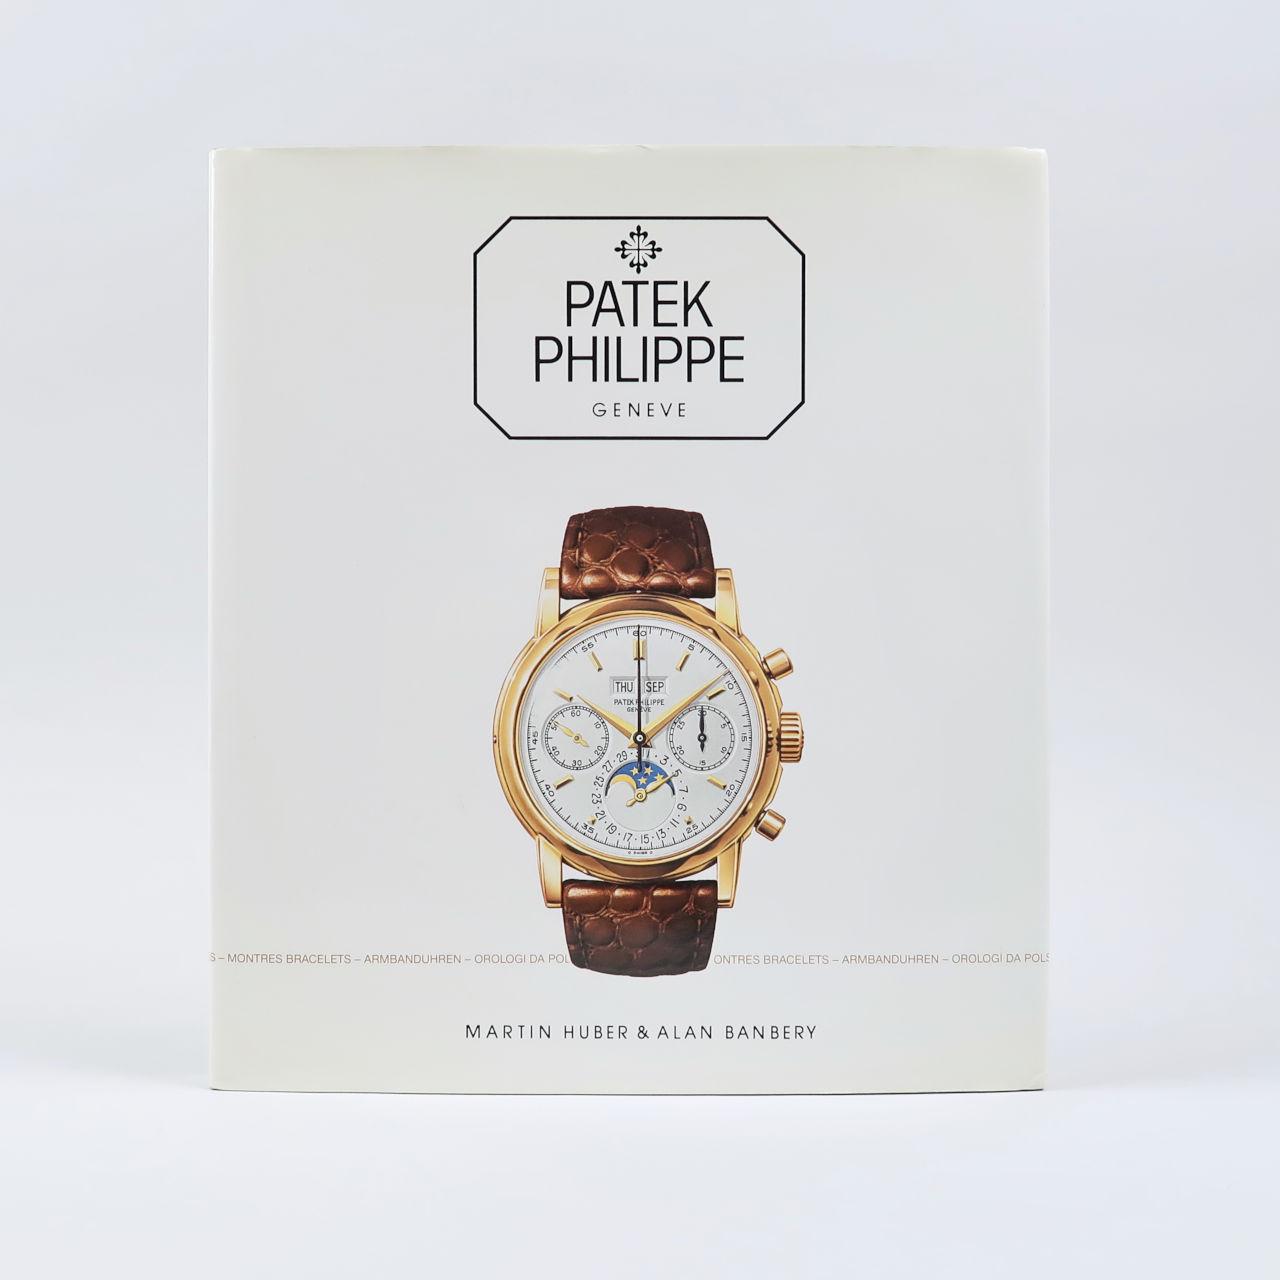 Patek Philippe Genève Wristwatches by Martin Huber & Alan Banbery